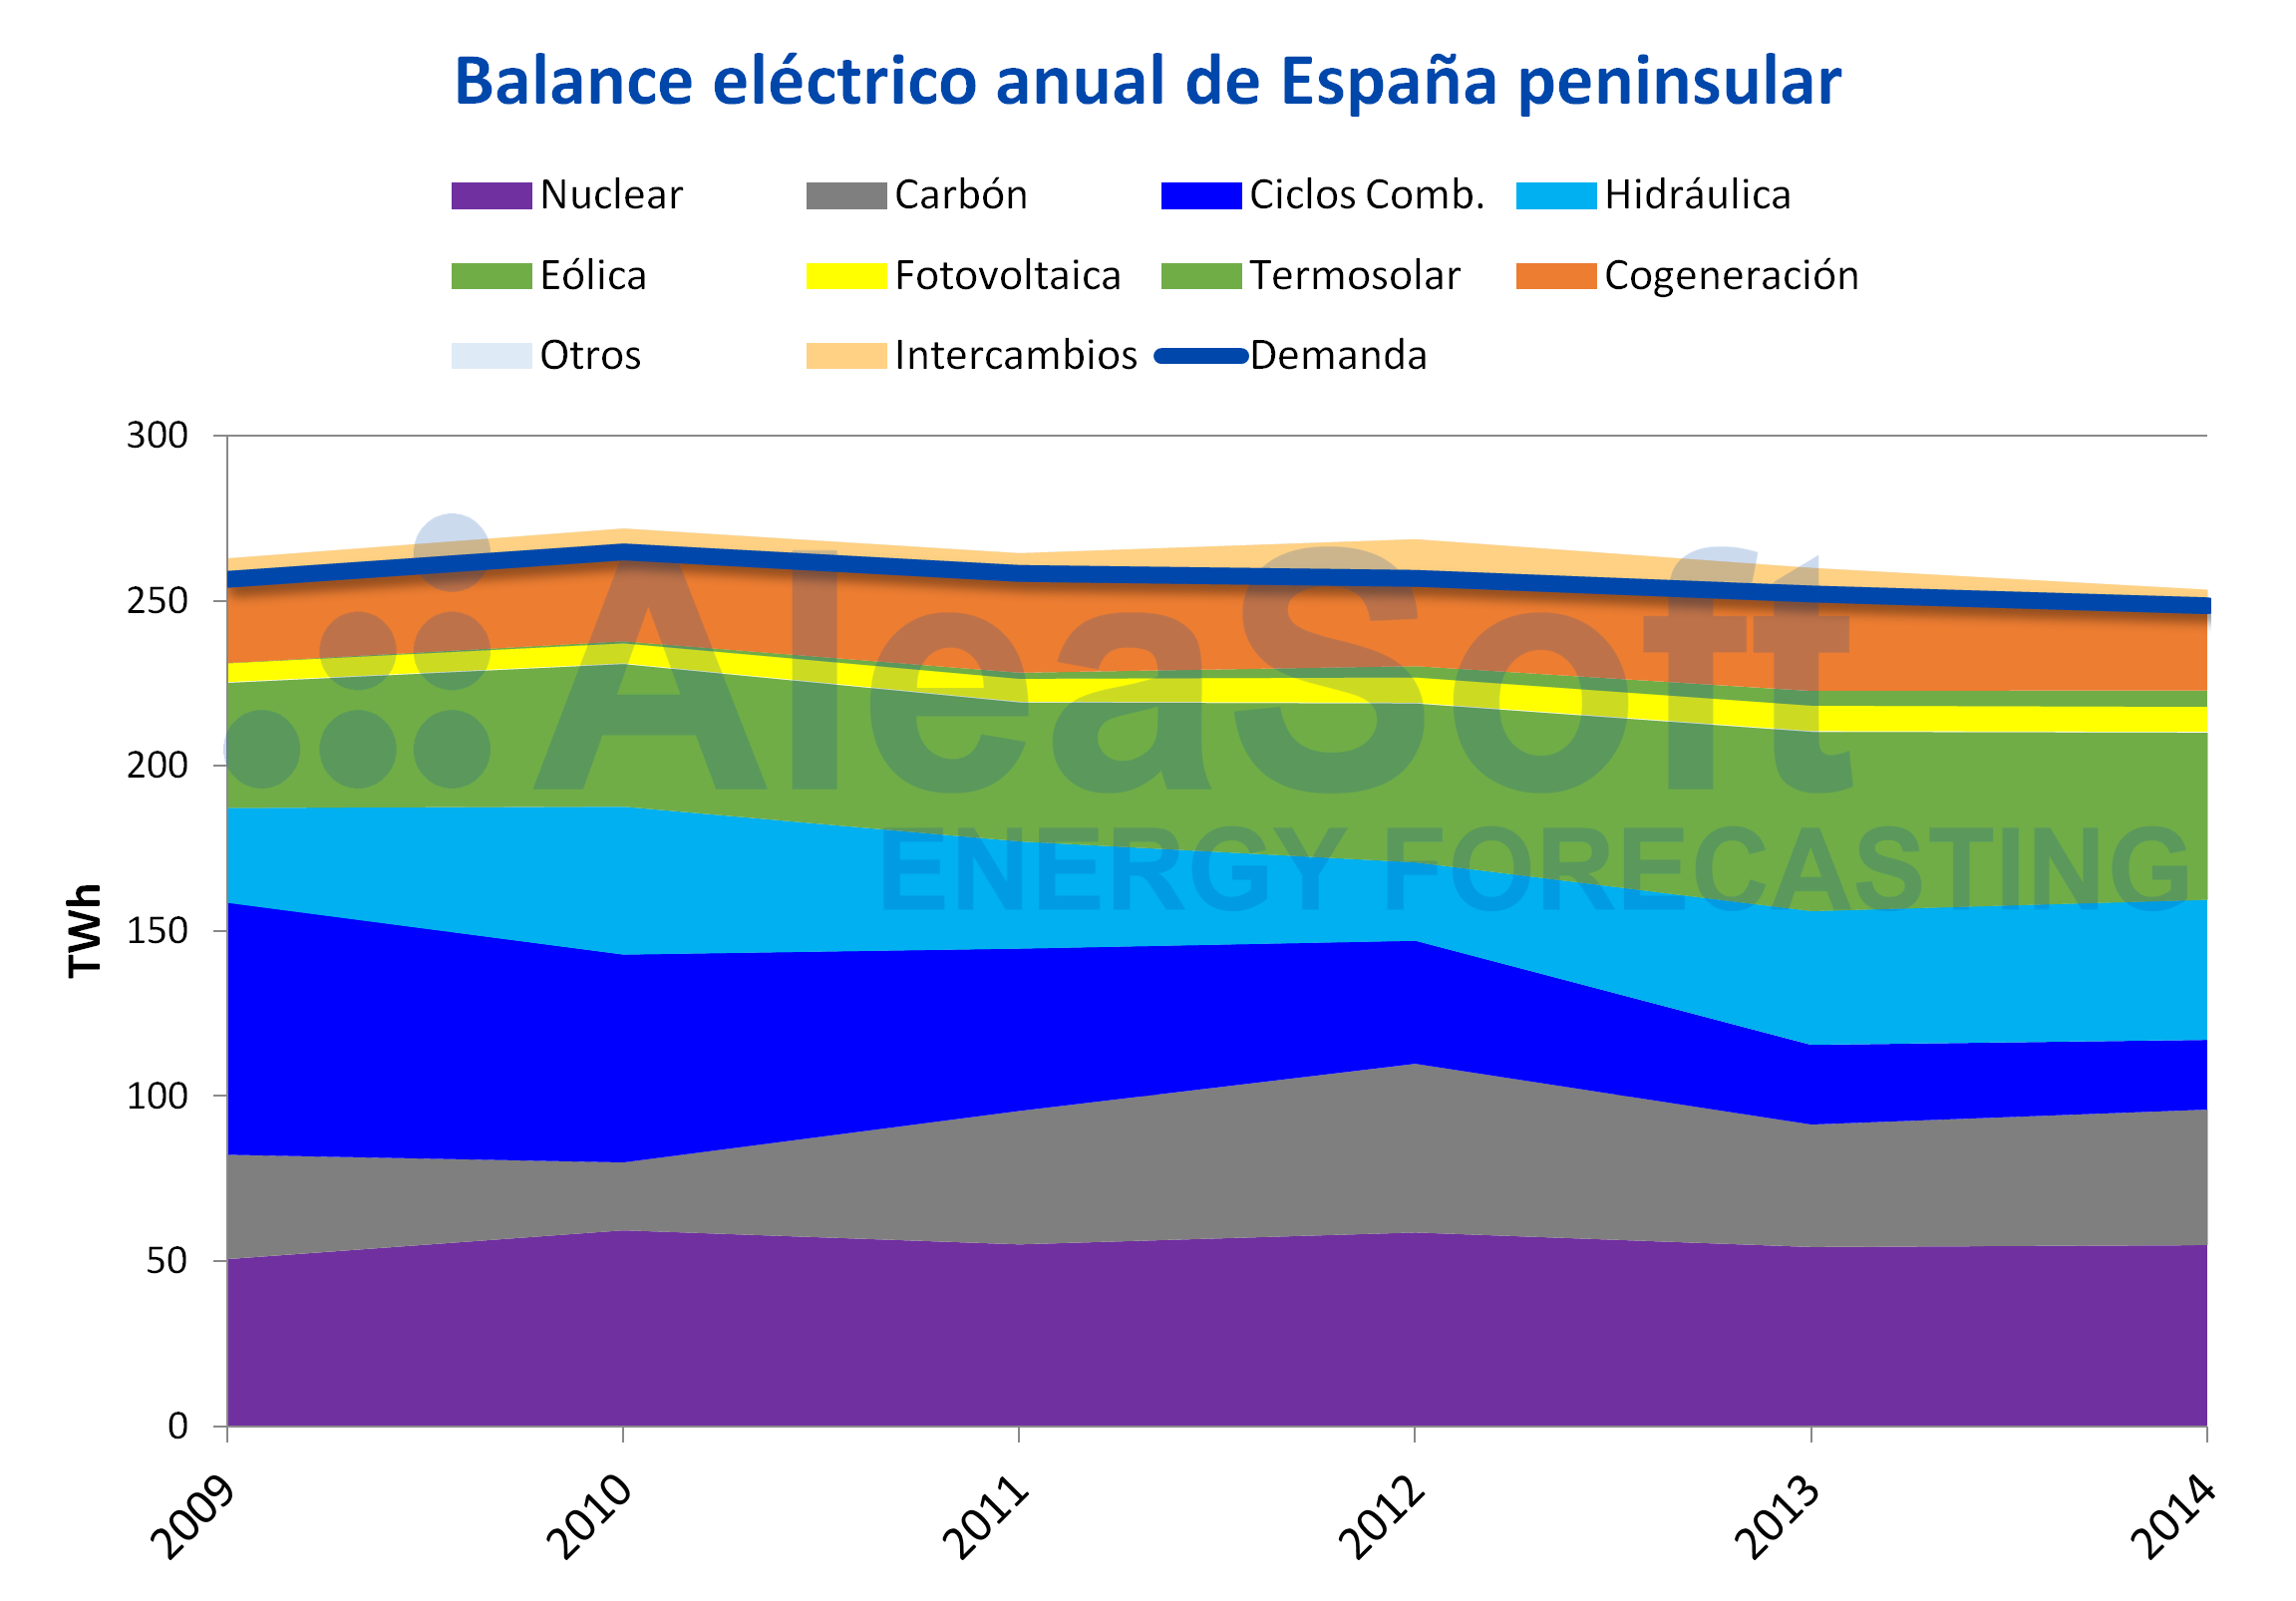 AleaSoft - Balance eléctrico anual España peninsular